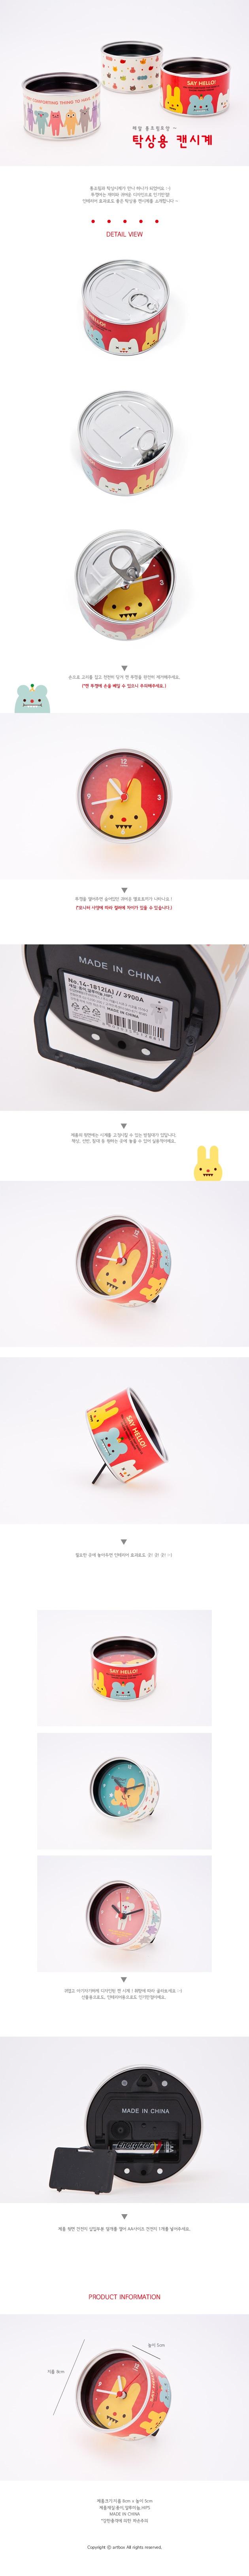 Just too cute desk clock packaging PD